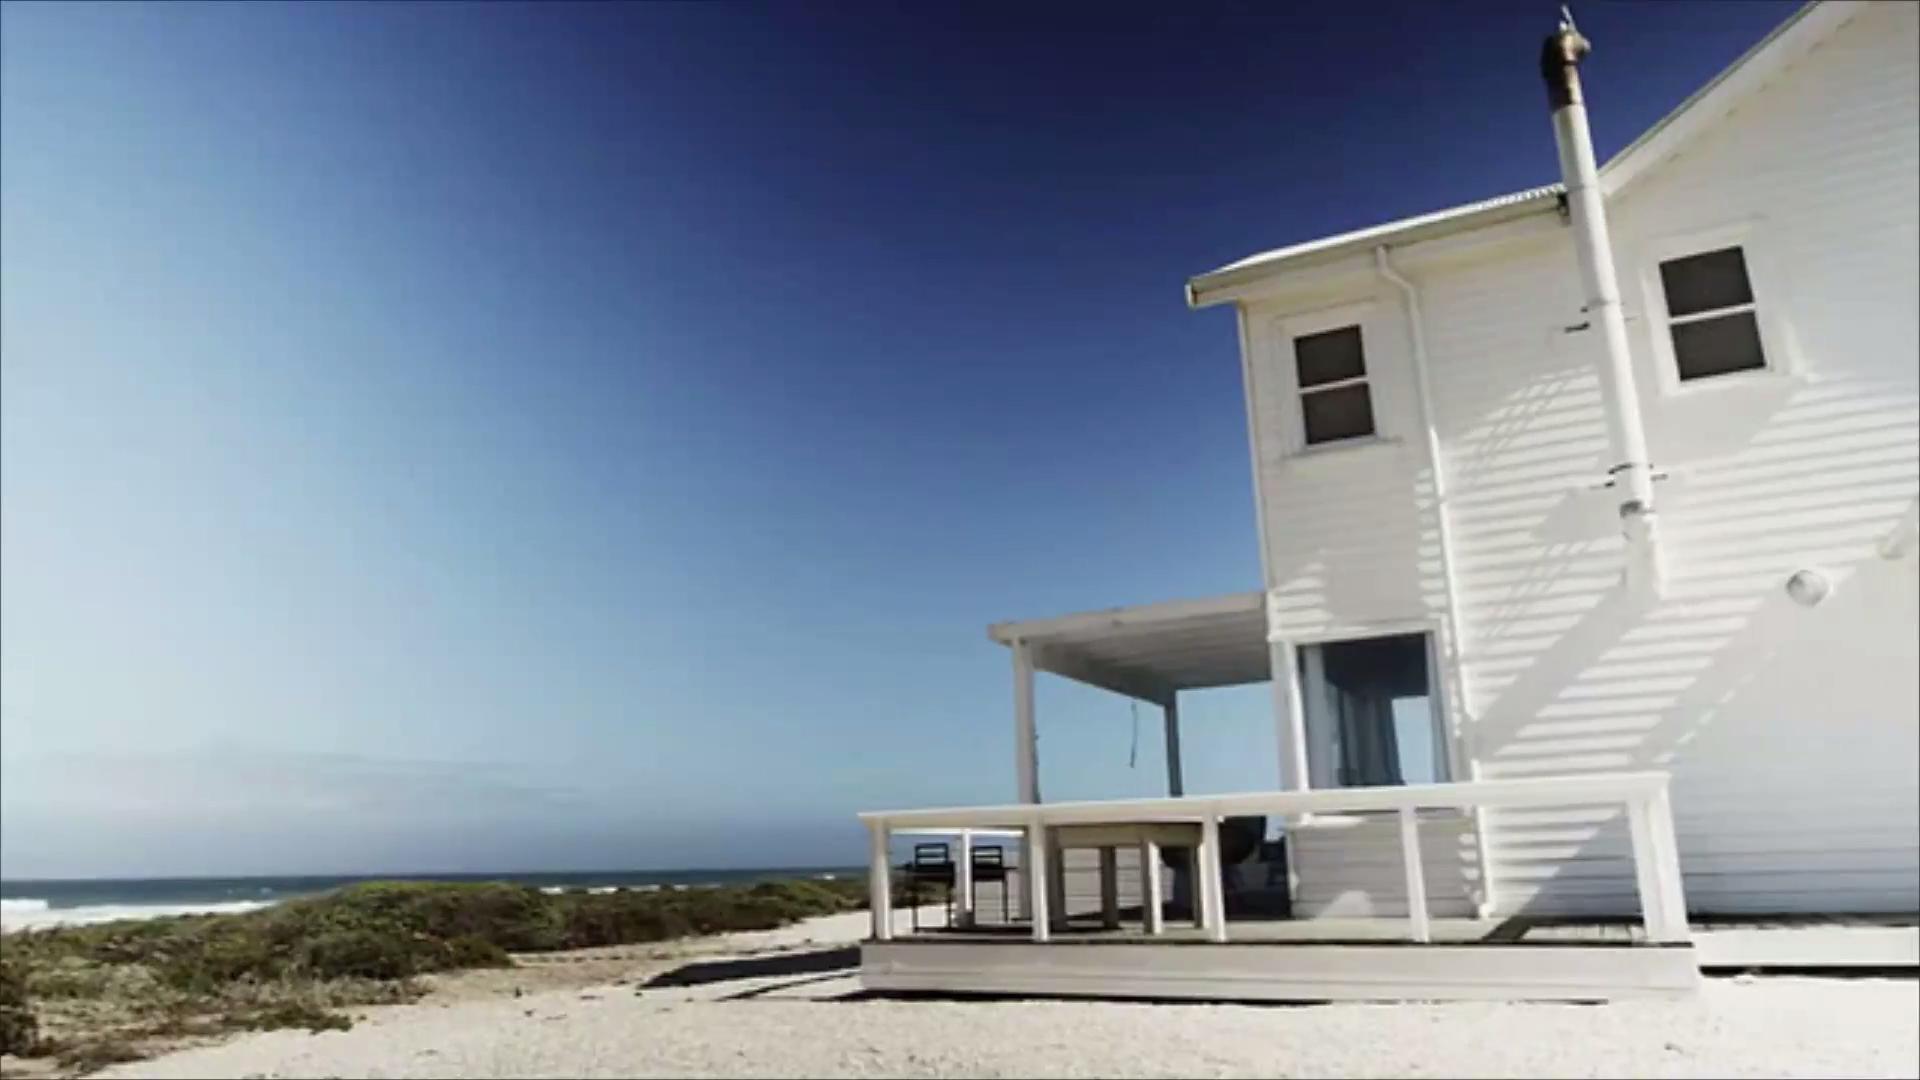 20 Best Coastal Design Tips - Coastal Living